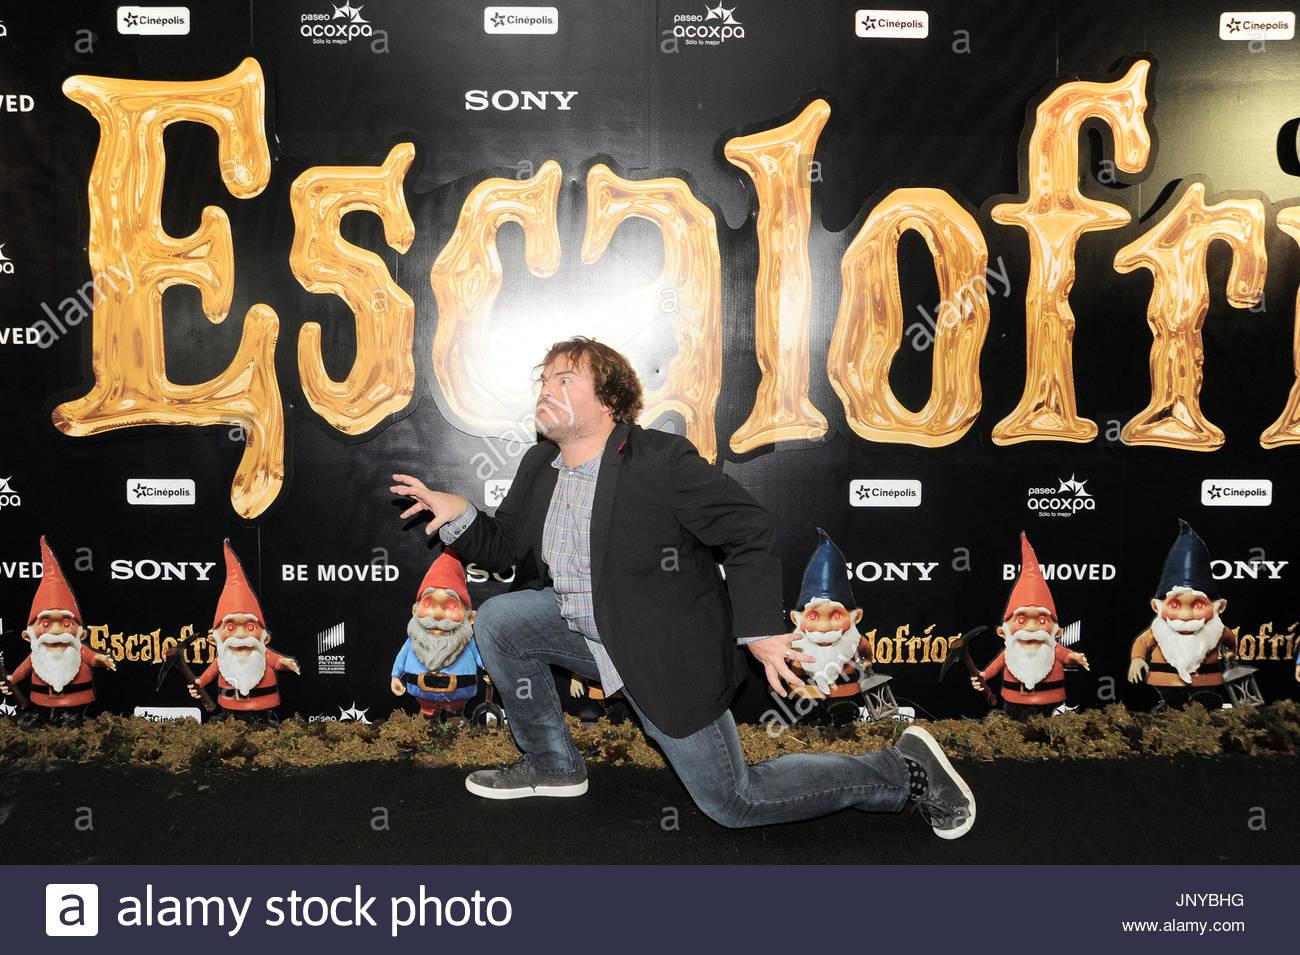 Goosebumps film stock photos goosebumps film stock for Cinepolis paseo acoxpa